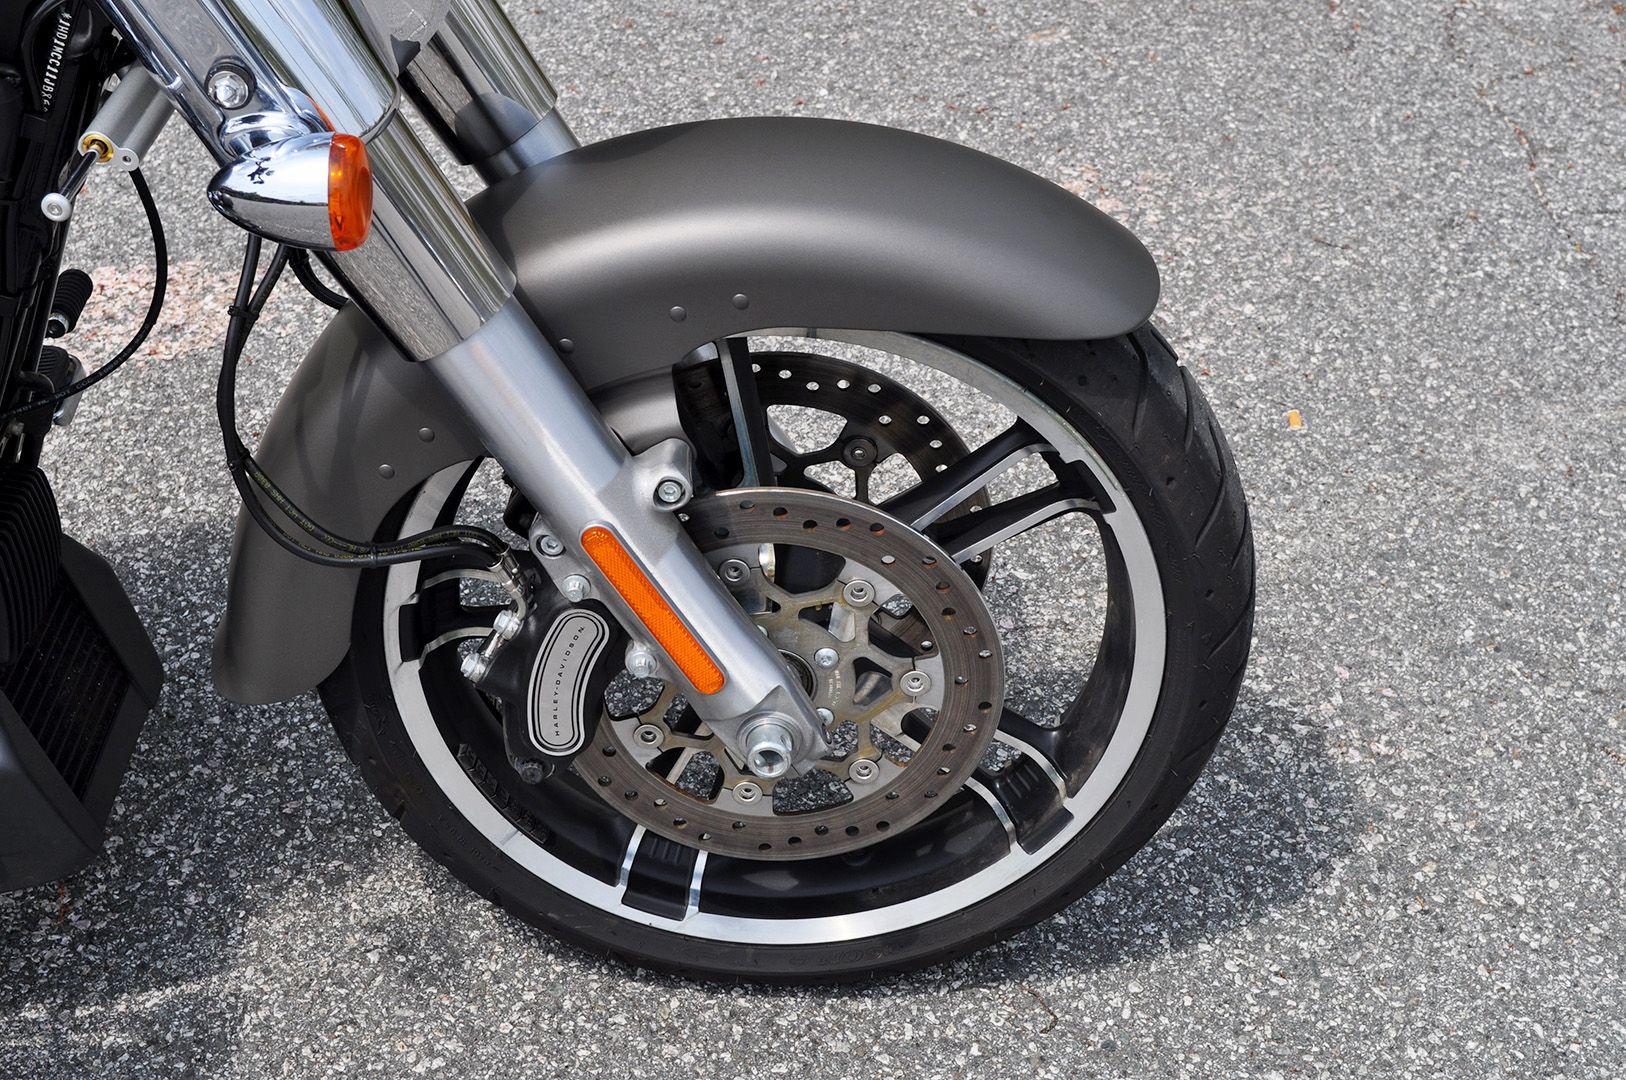 Pre-Owned 2018 Harley-Davidson Freewheeler